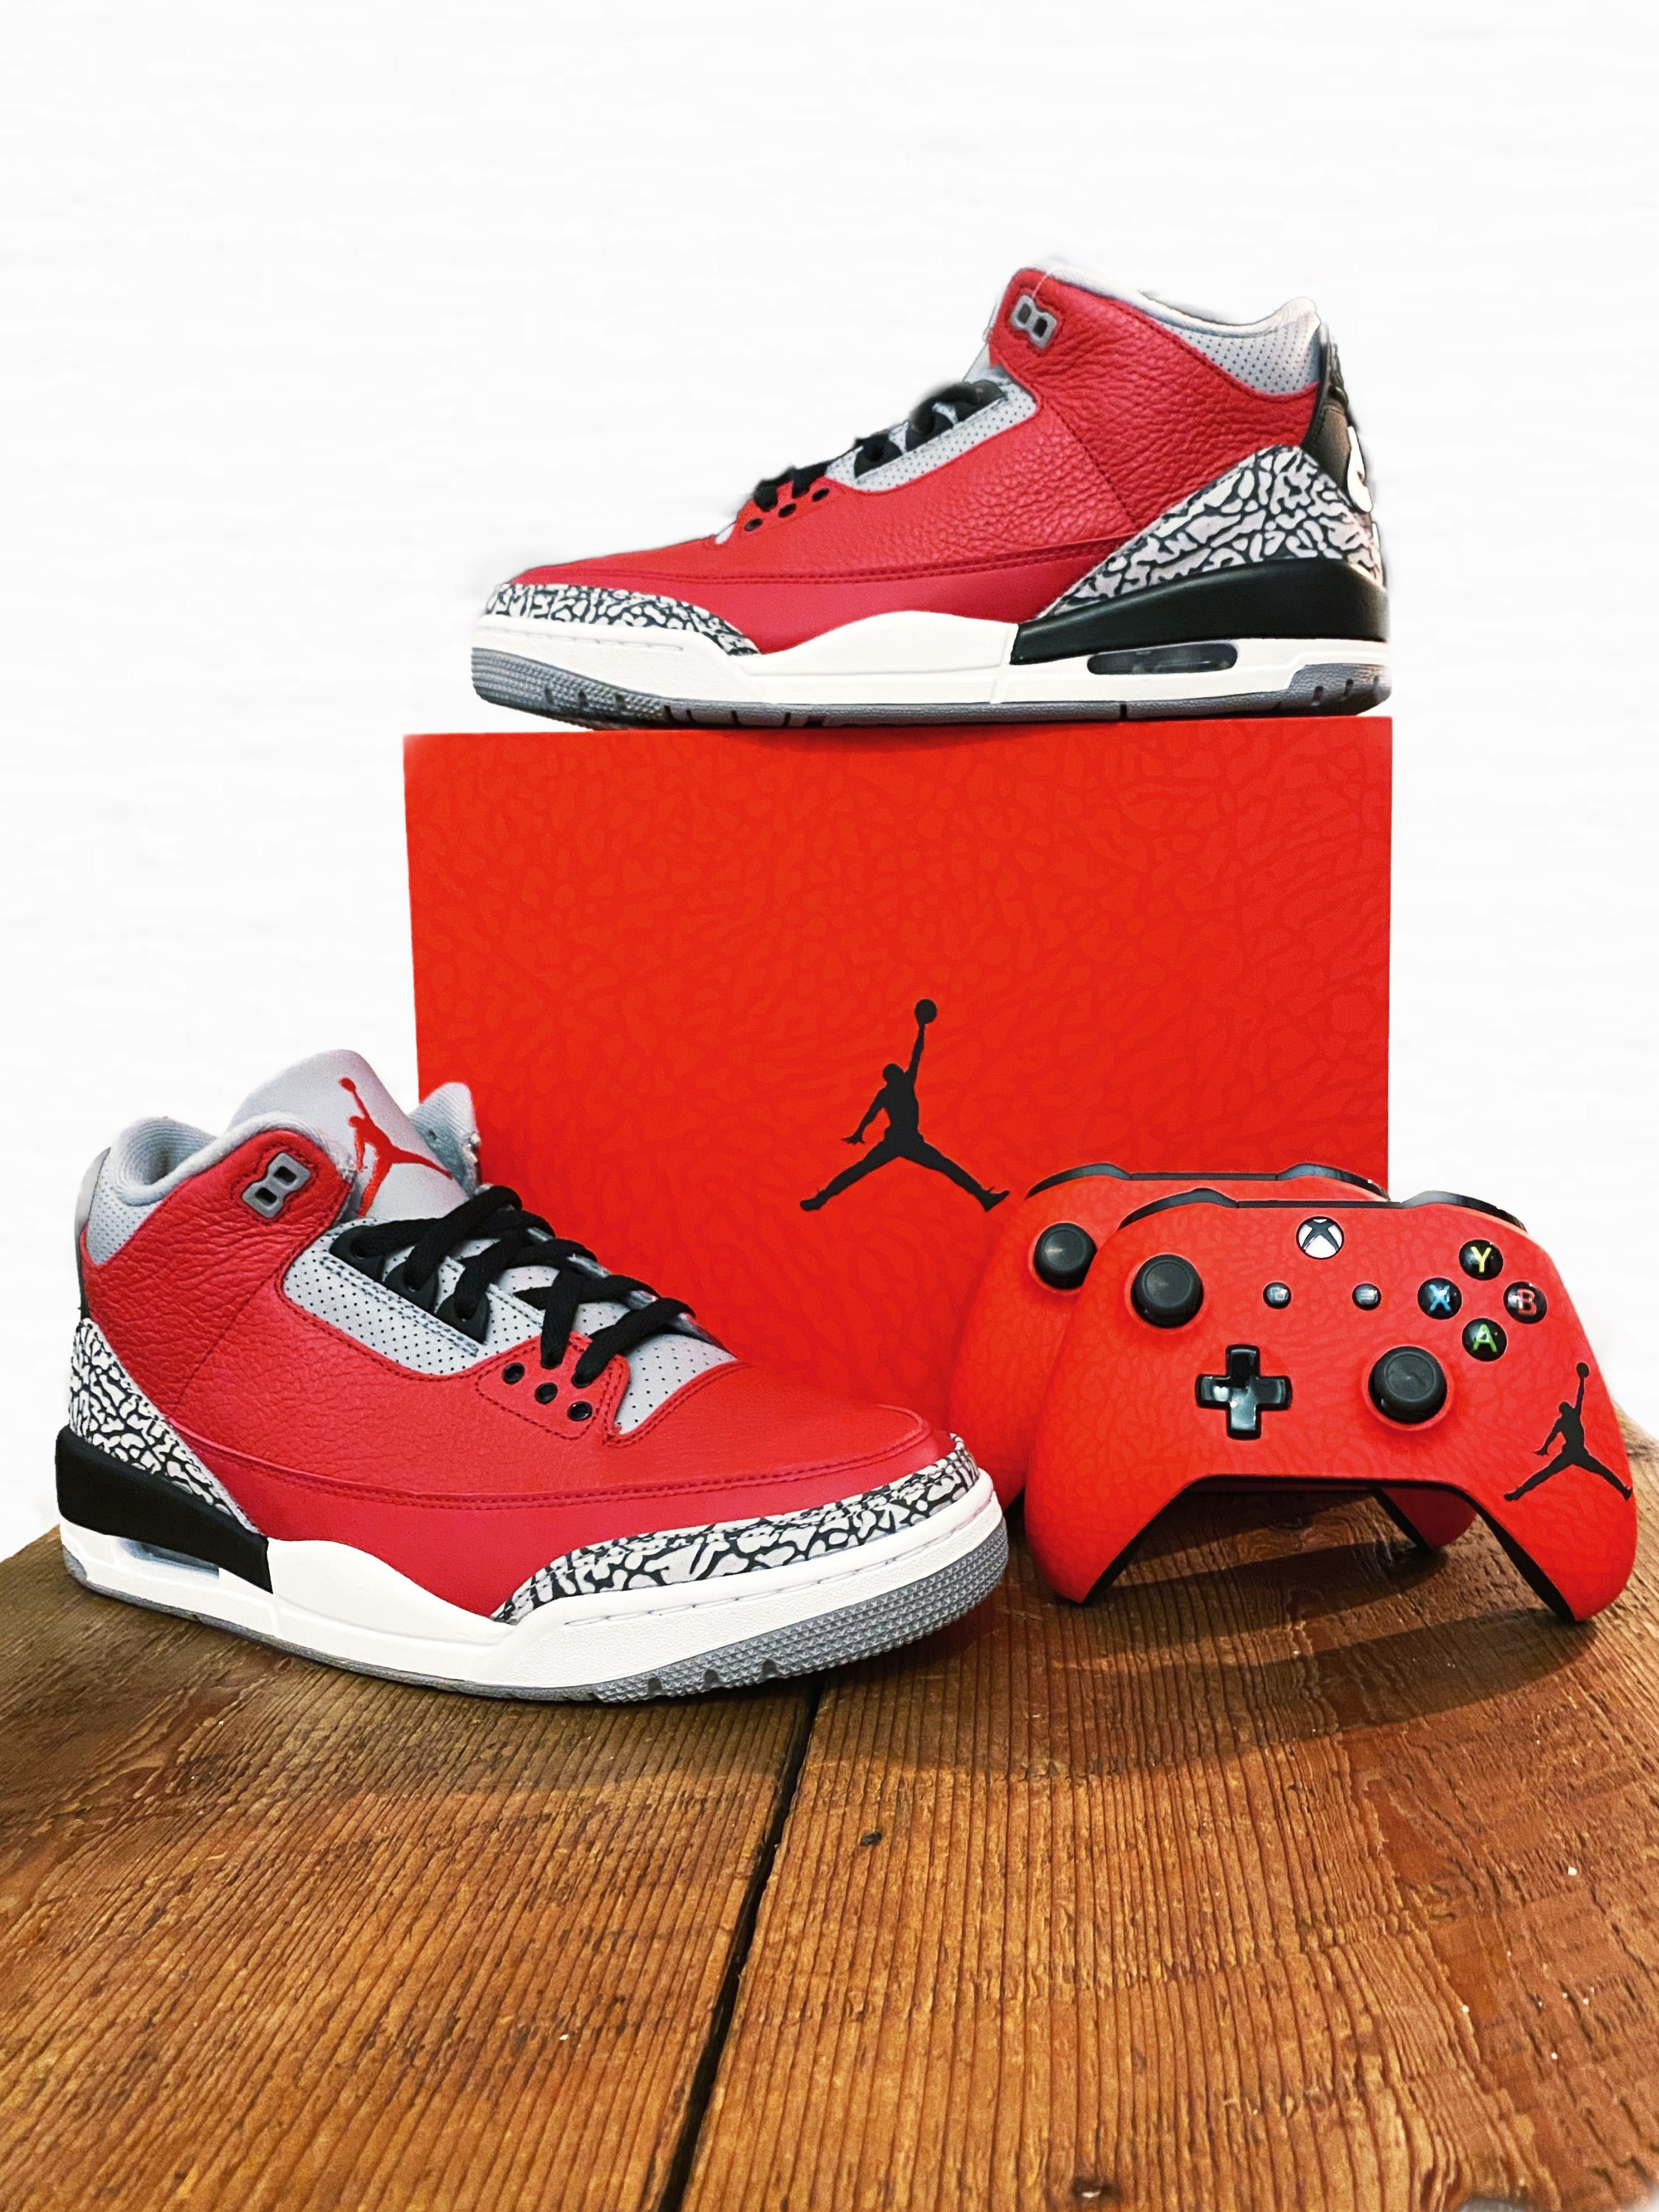 Jordan and Xbox's New 2020